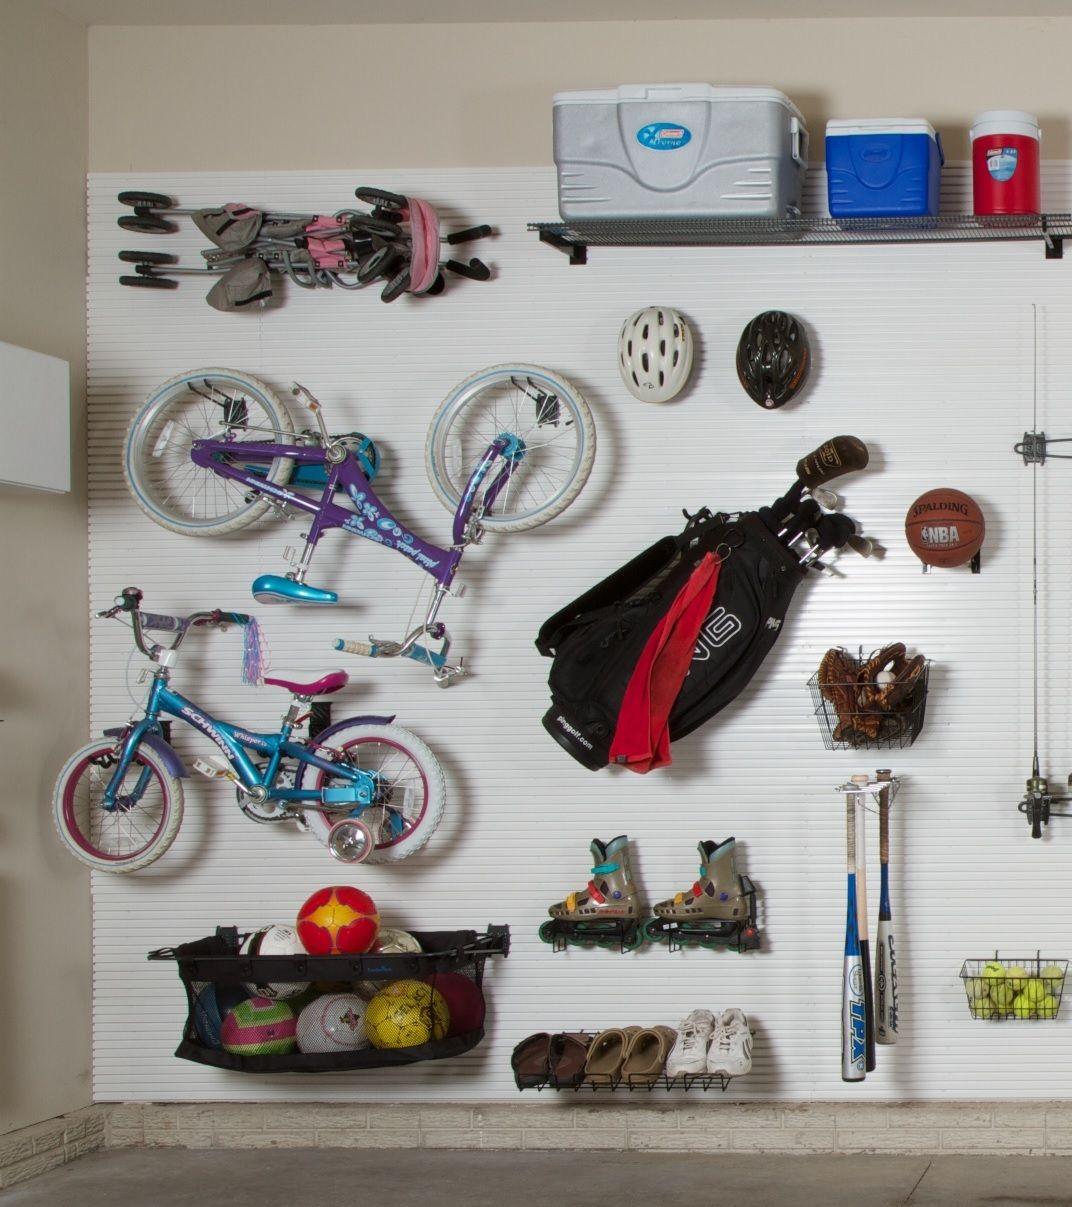 Garage Slatwall Accessories for Sports Equipment Storage